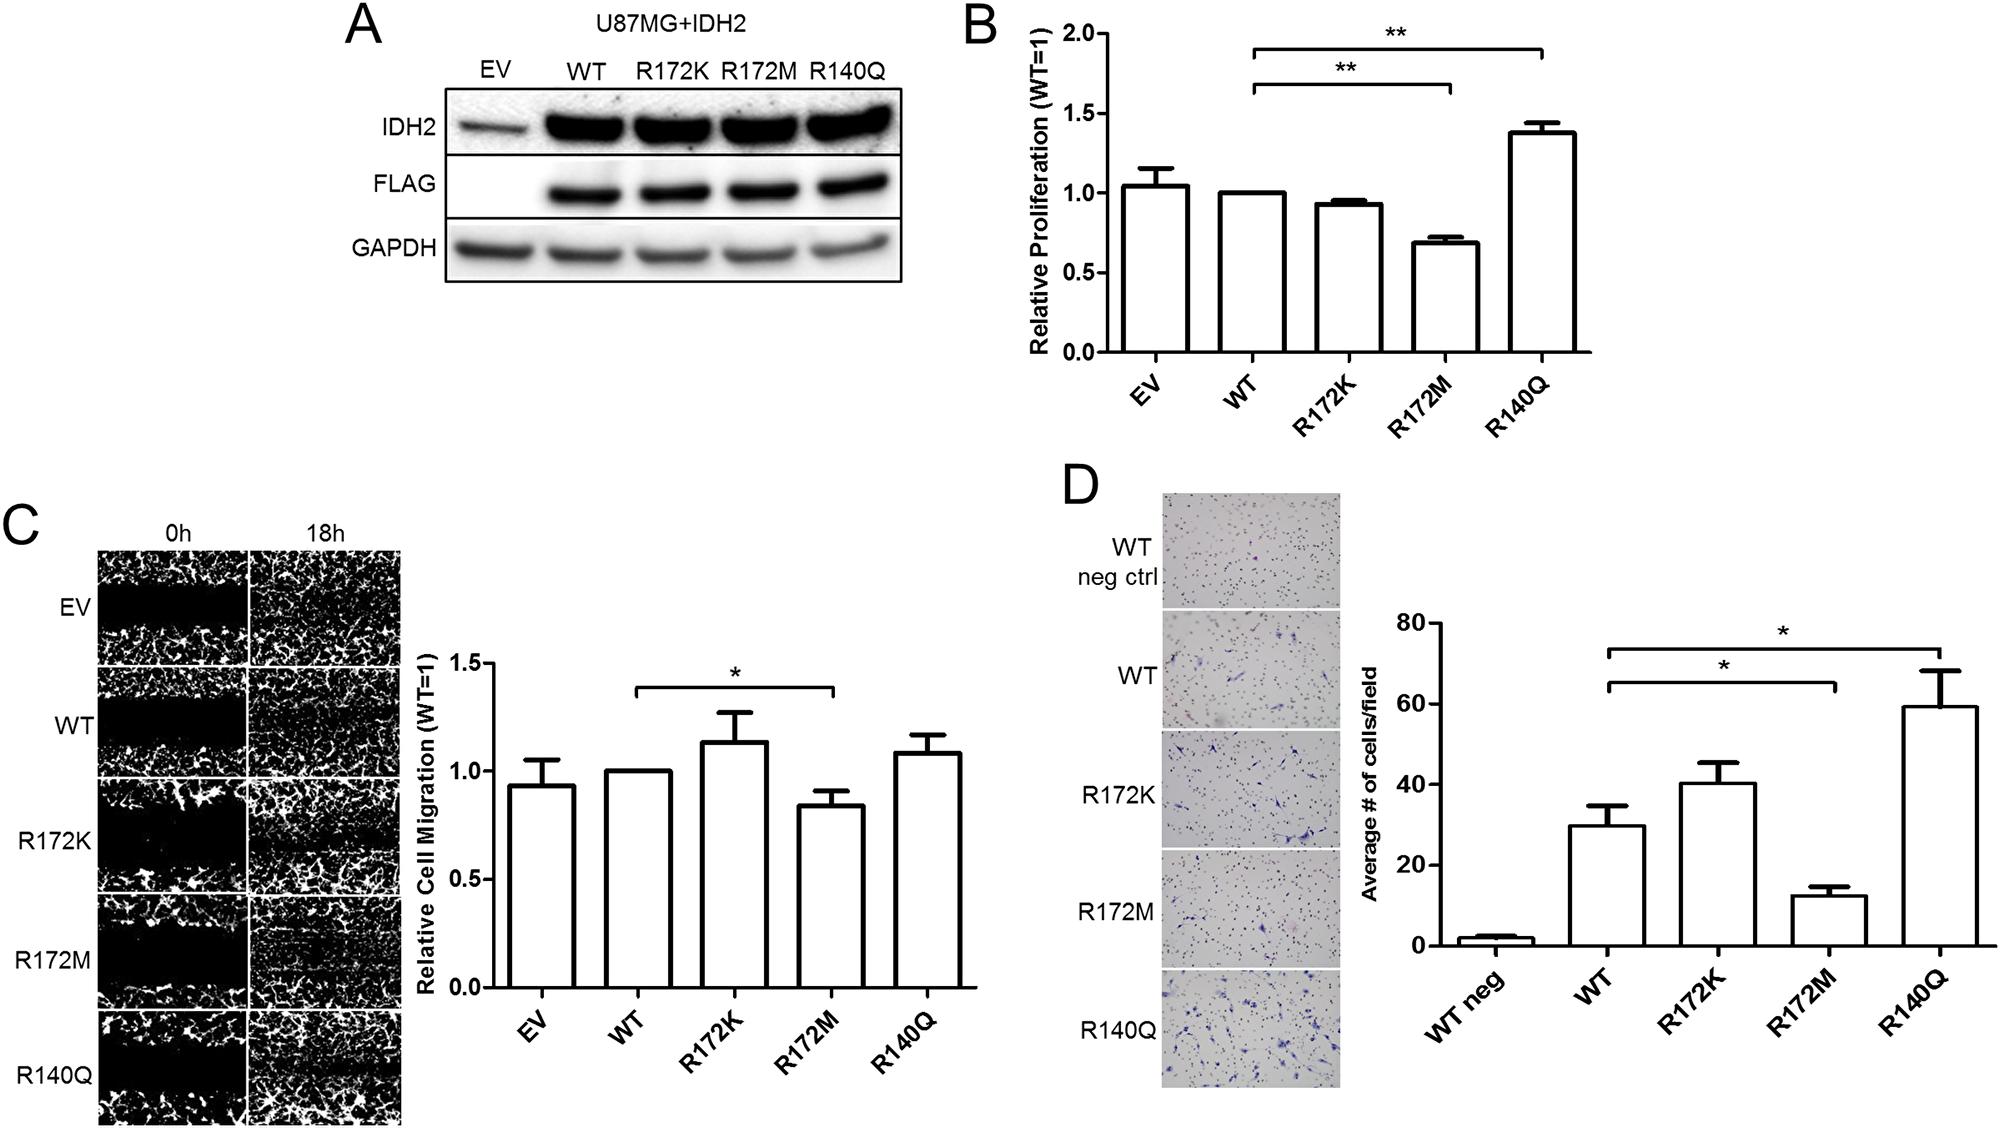 IDH2 mutations alter the tumorigenic properties of U87MG glioblastoma cells.